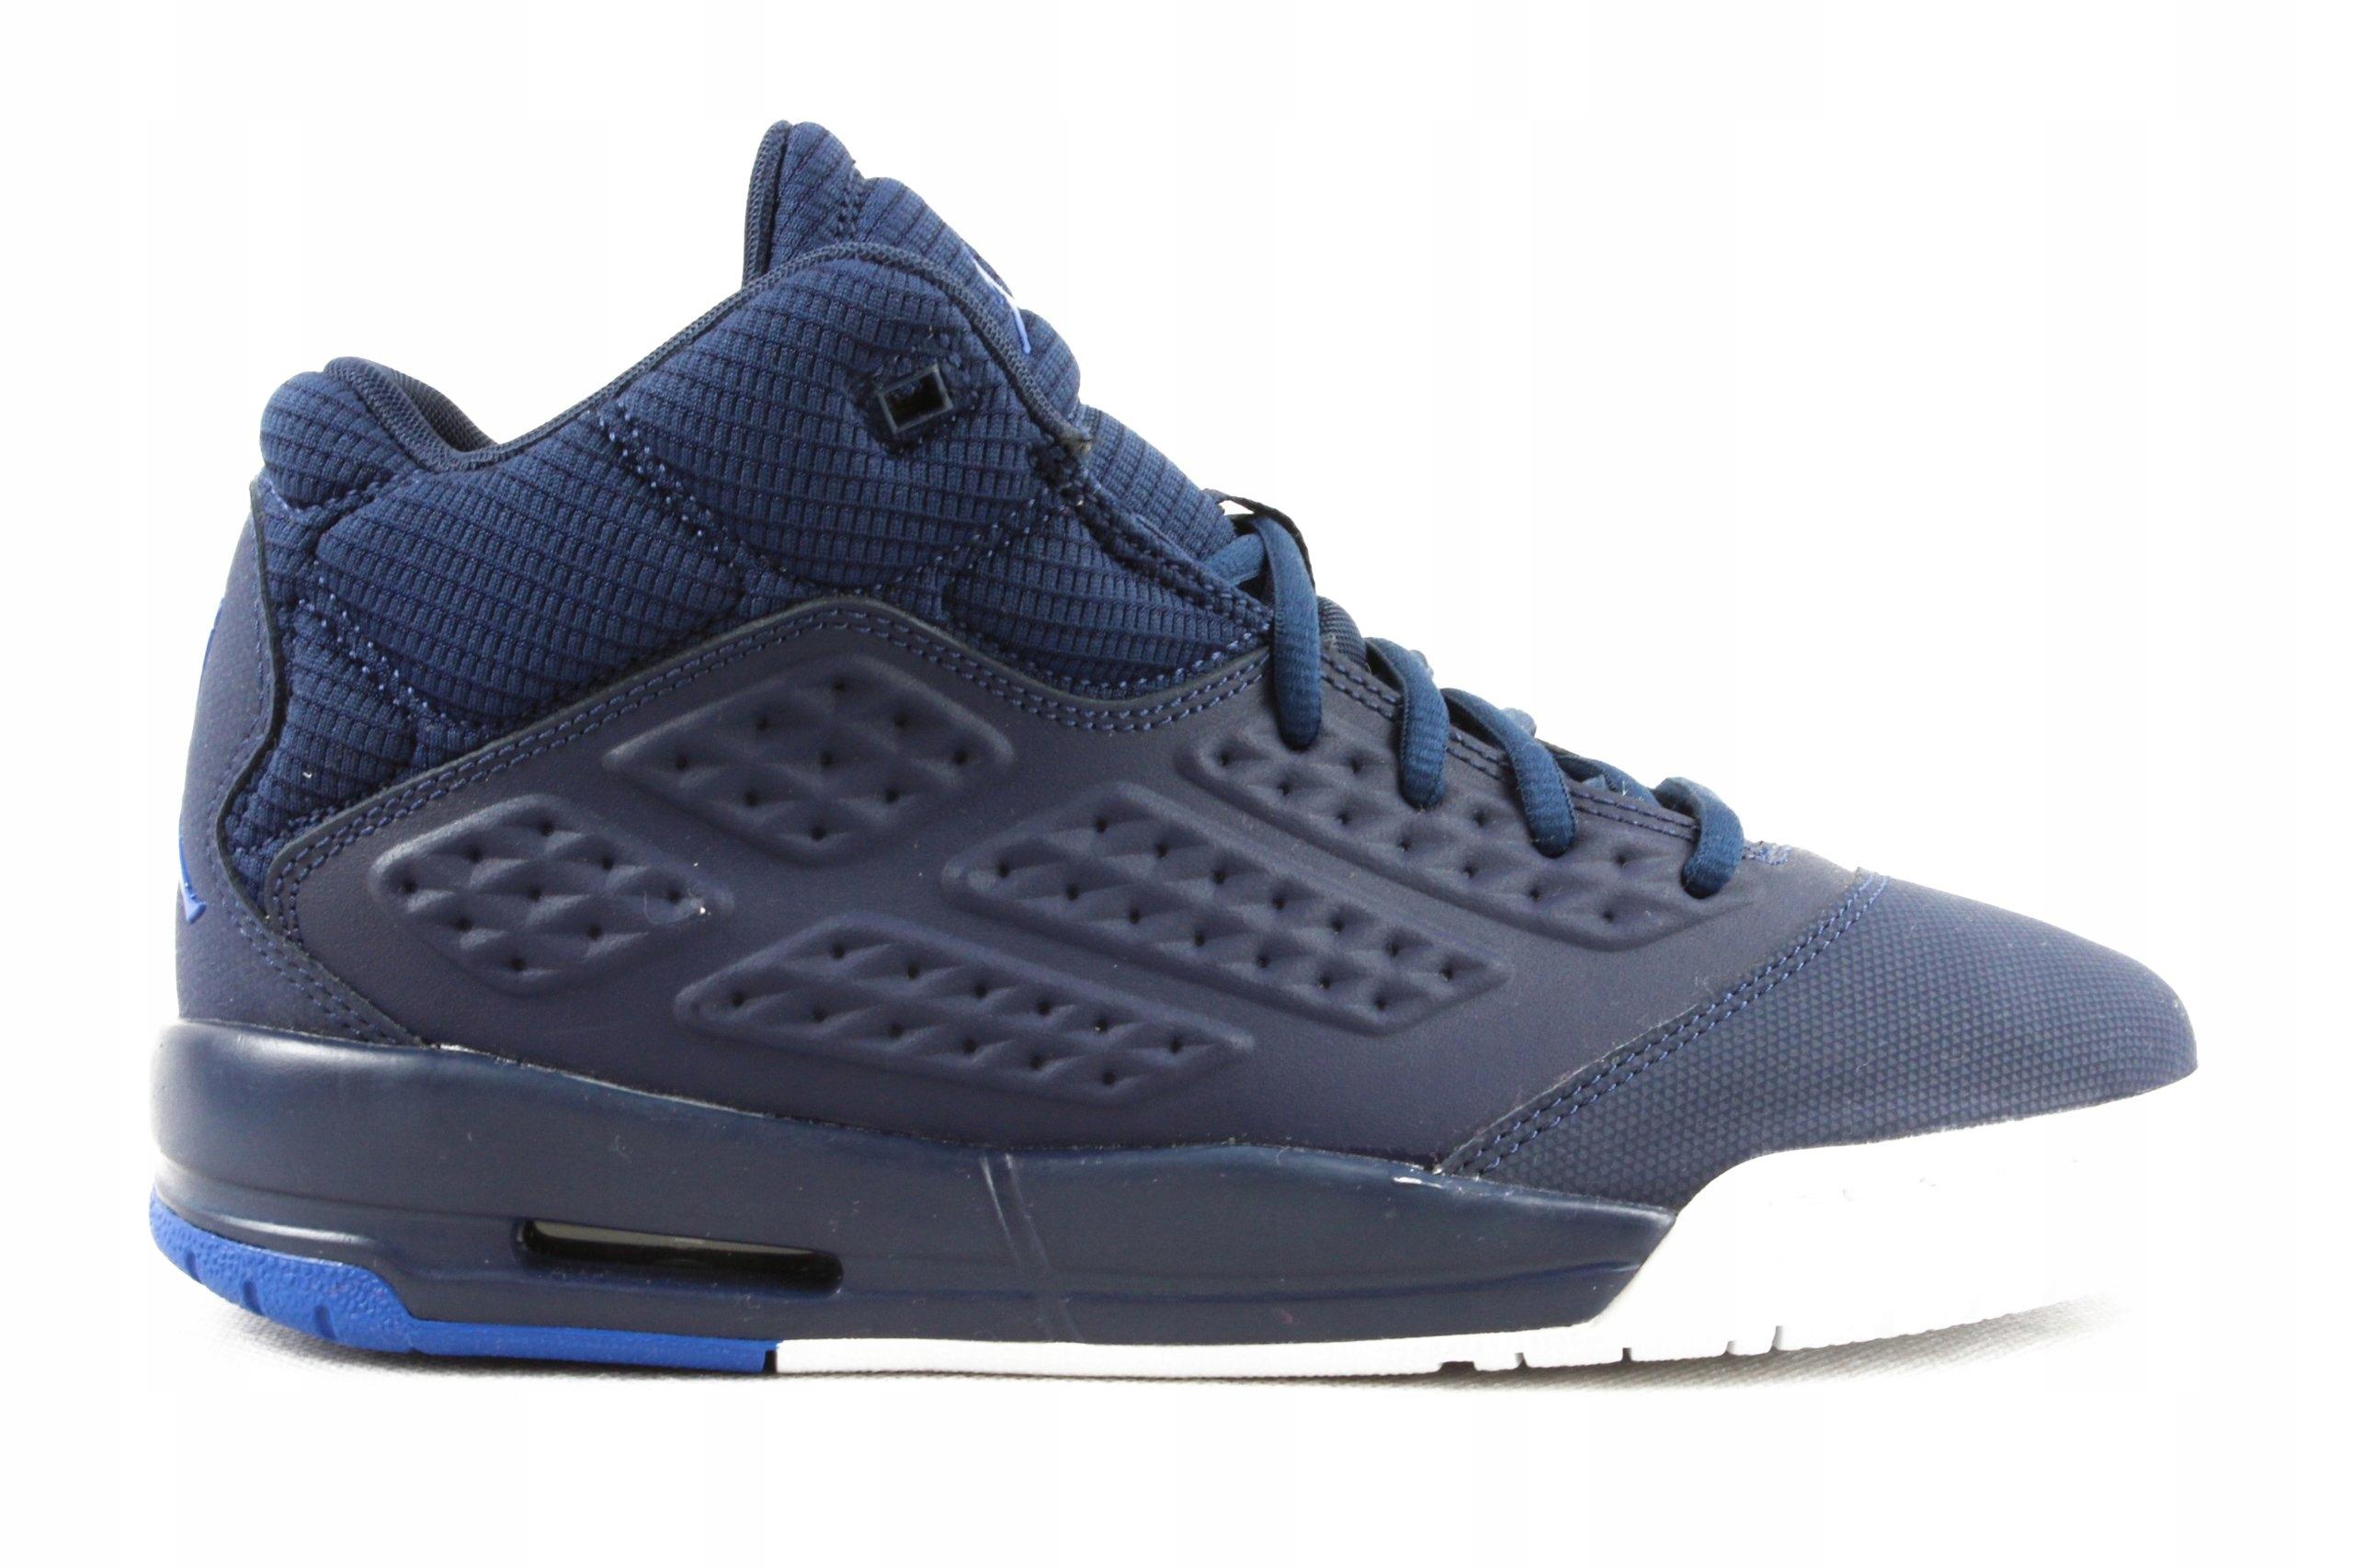 new concept 92ec3 e3596 Buty Nike Jordan New School BG rozm 36.5 Lebron Kd